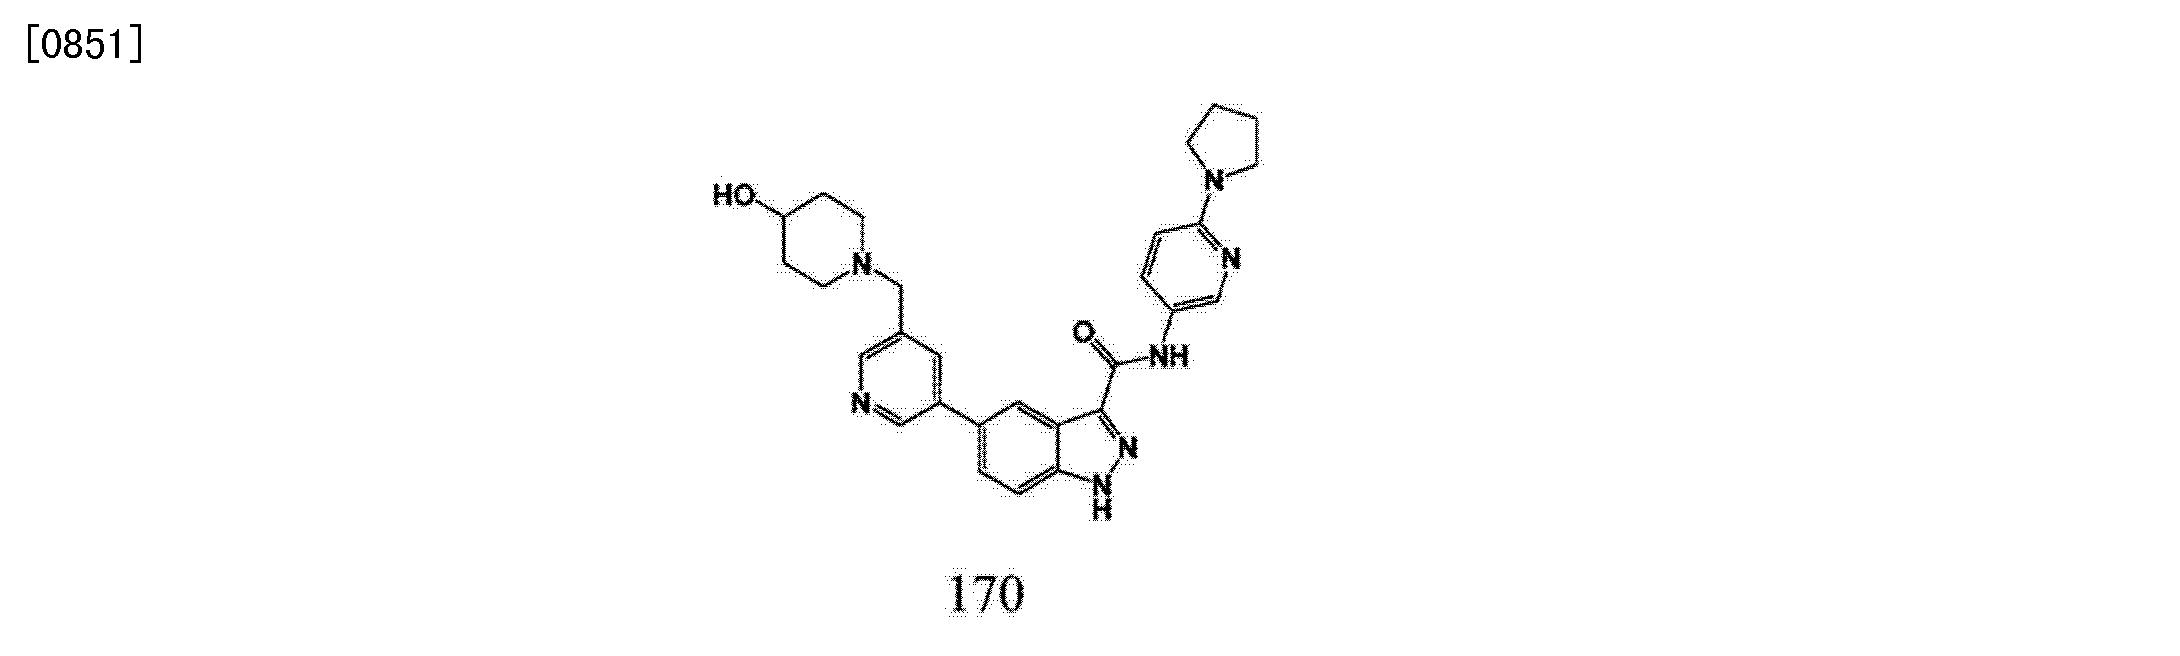 Figure CN103929963AD02012